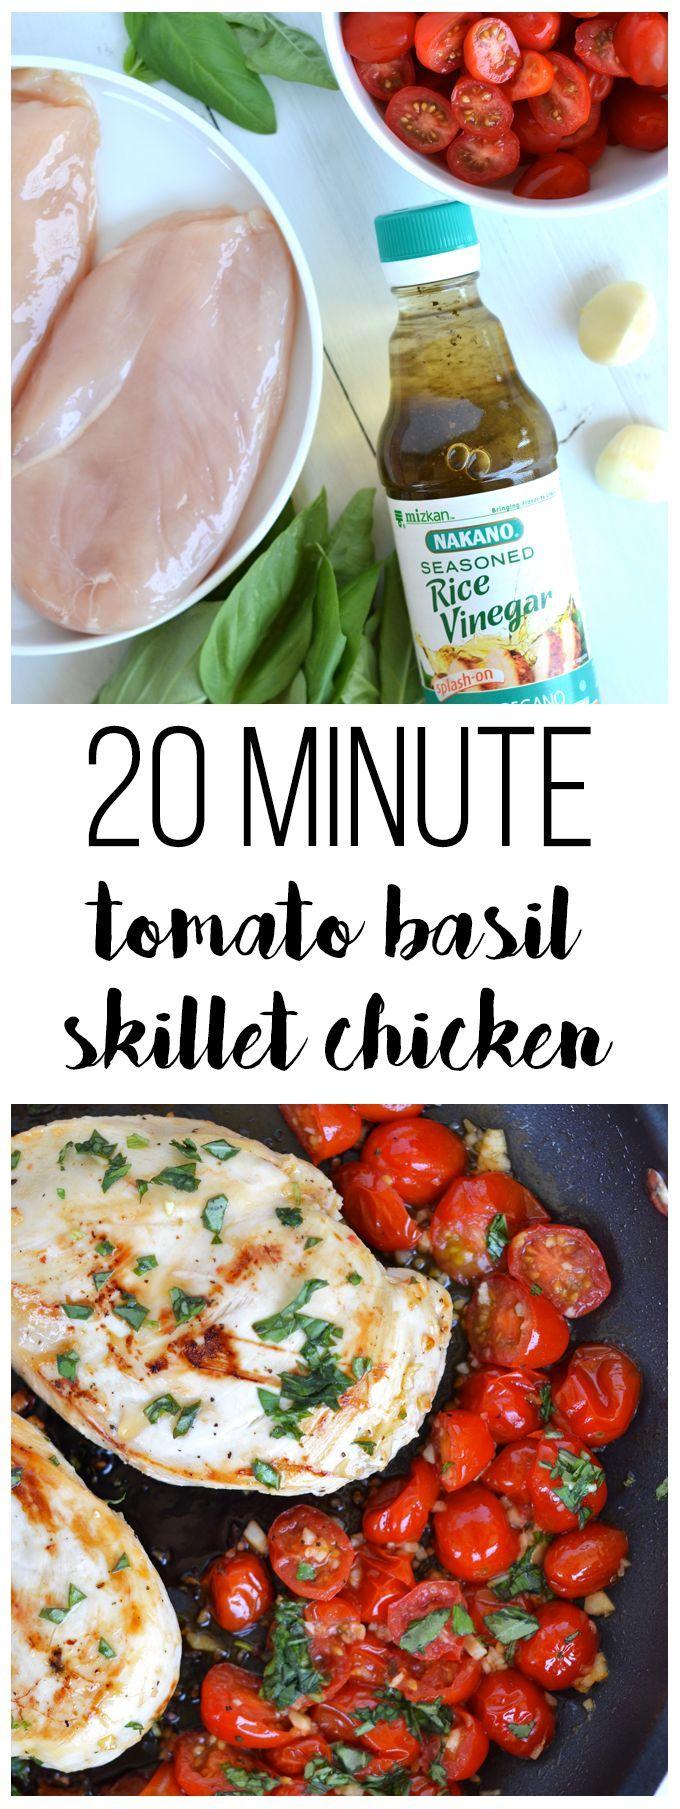 5861 best real food blogger favorites images on pinterest 20 minute tomato basil skillet chicken forumfinder Image collections